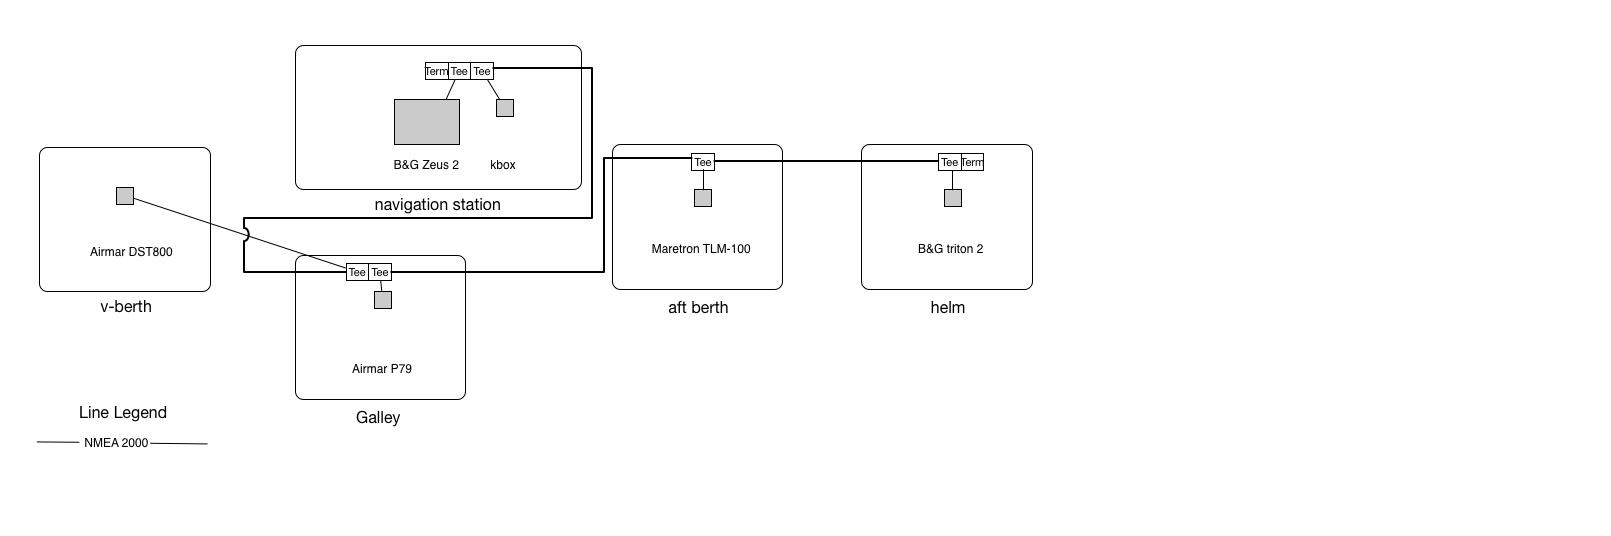 Humminbird Gps Nmea 2000 Network Diagram Trusted Wiring Diagrams Lowrance Networking Setup